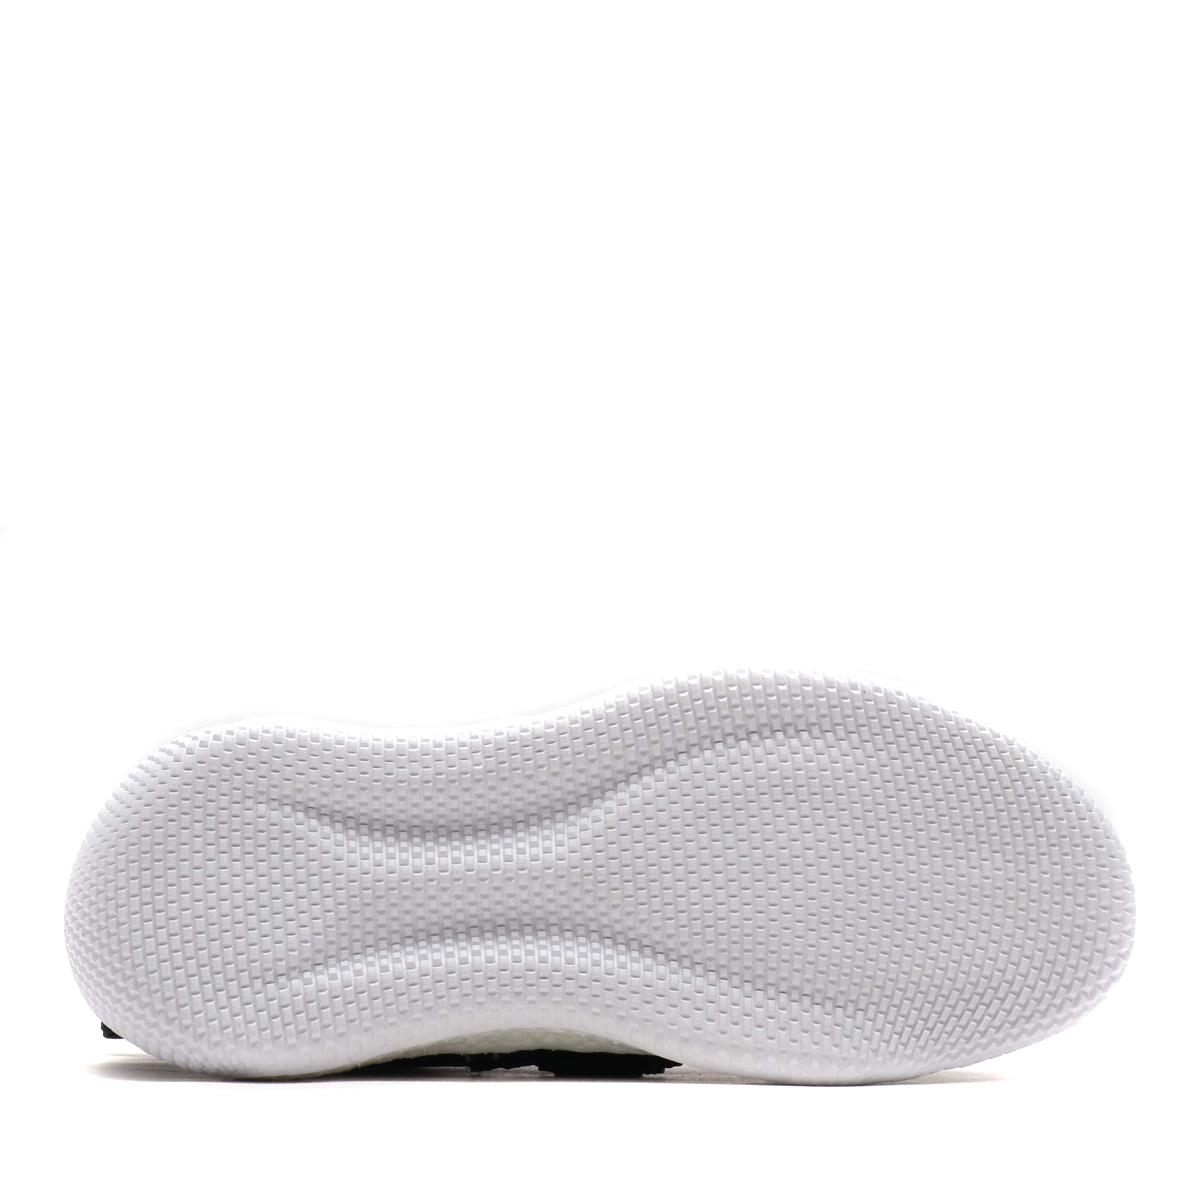 9b985e03f571 adidas Harden LS 2 BUCKLE (Adidas Arthur Harden LS2 buckle) Core Black Running  White Gold Met 18FW-I